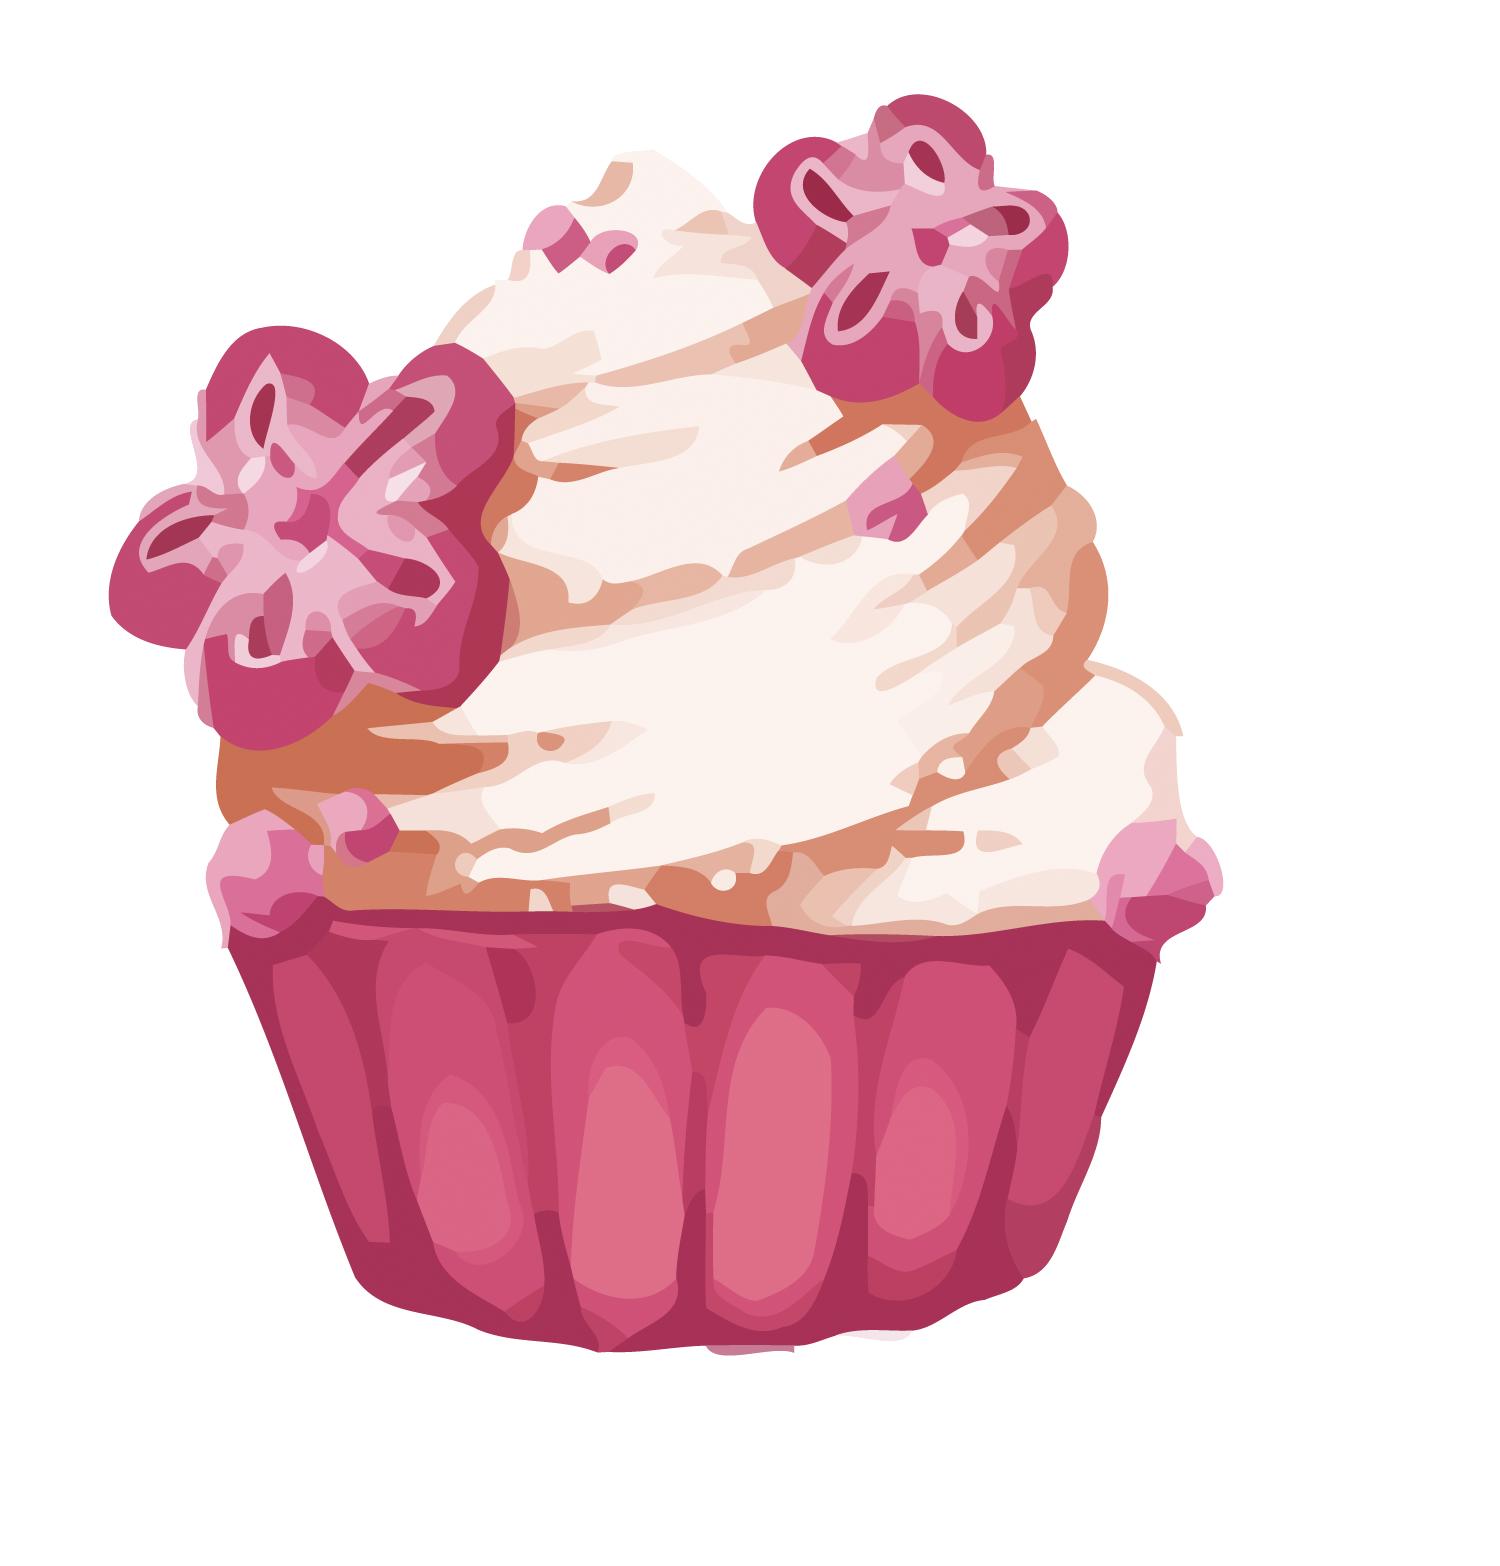 Cupcake macaron vector cherry. Muffin clipart pastry